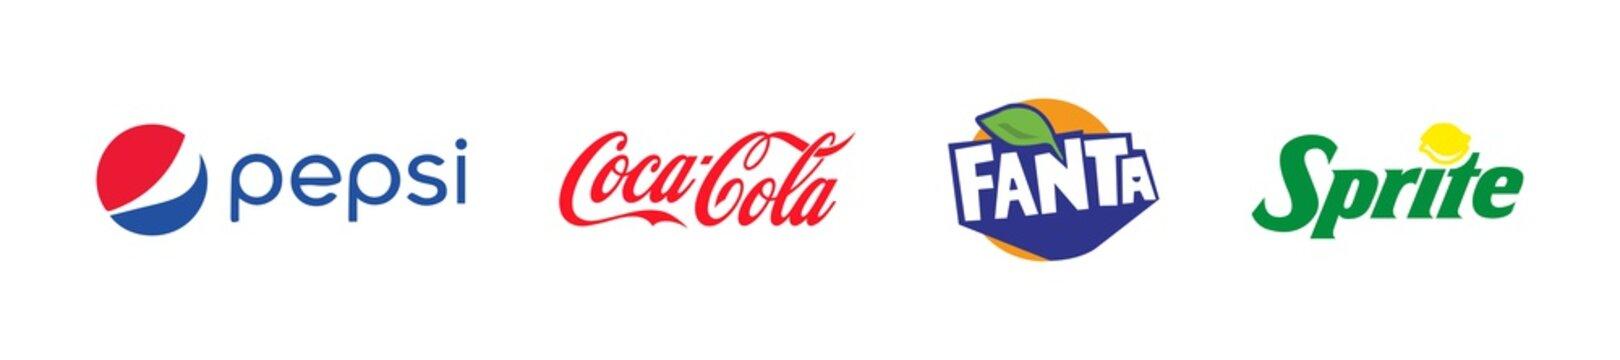 Kiev, Ukraine - June 30, 2021: Popular soft drinks logo set. Pepsi Coca Cola Fanta Sprite. Vector illustration.